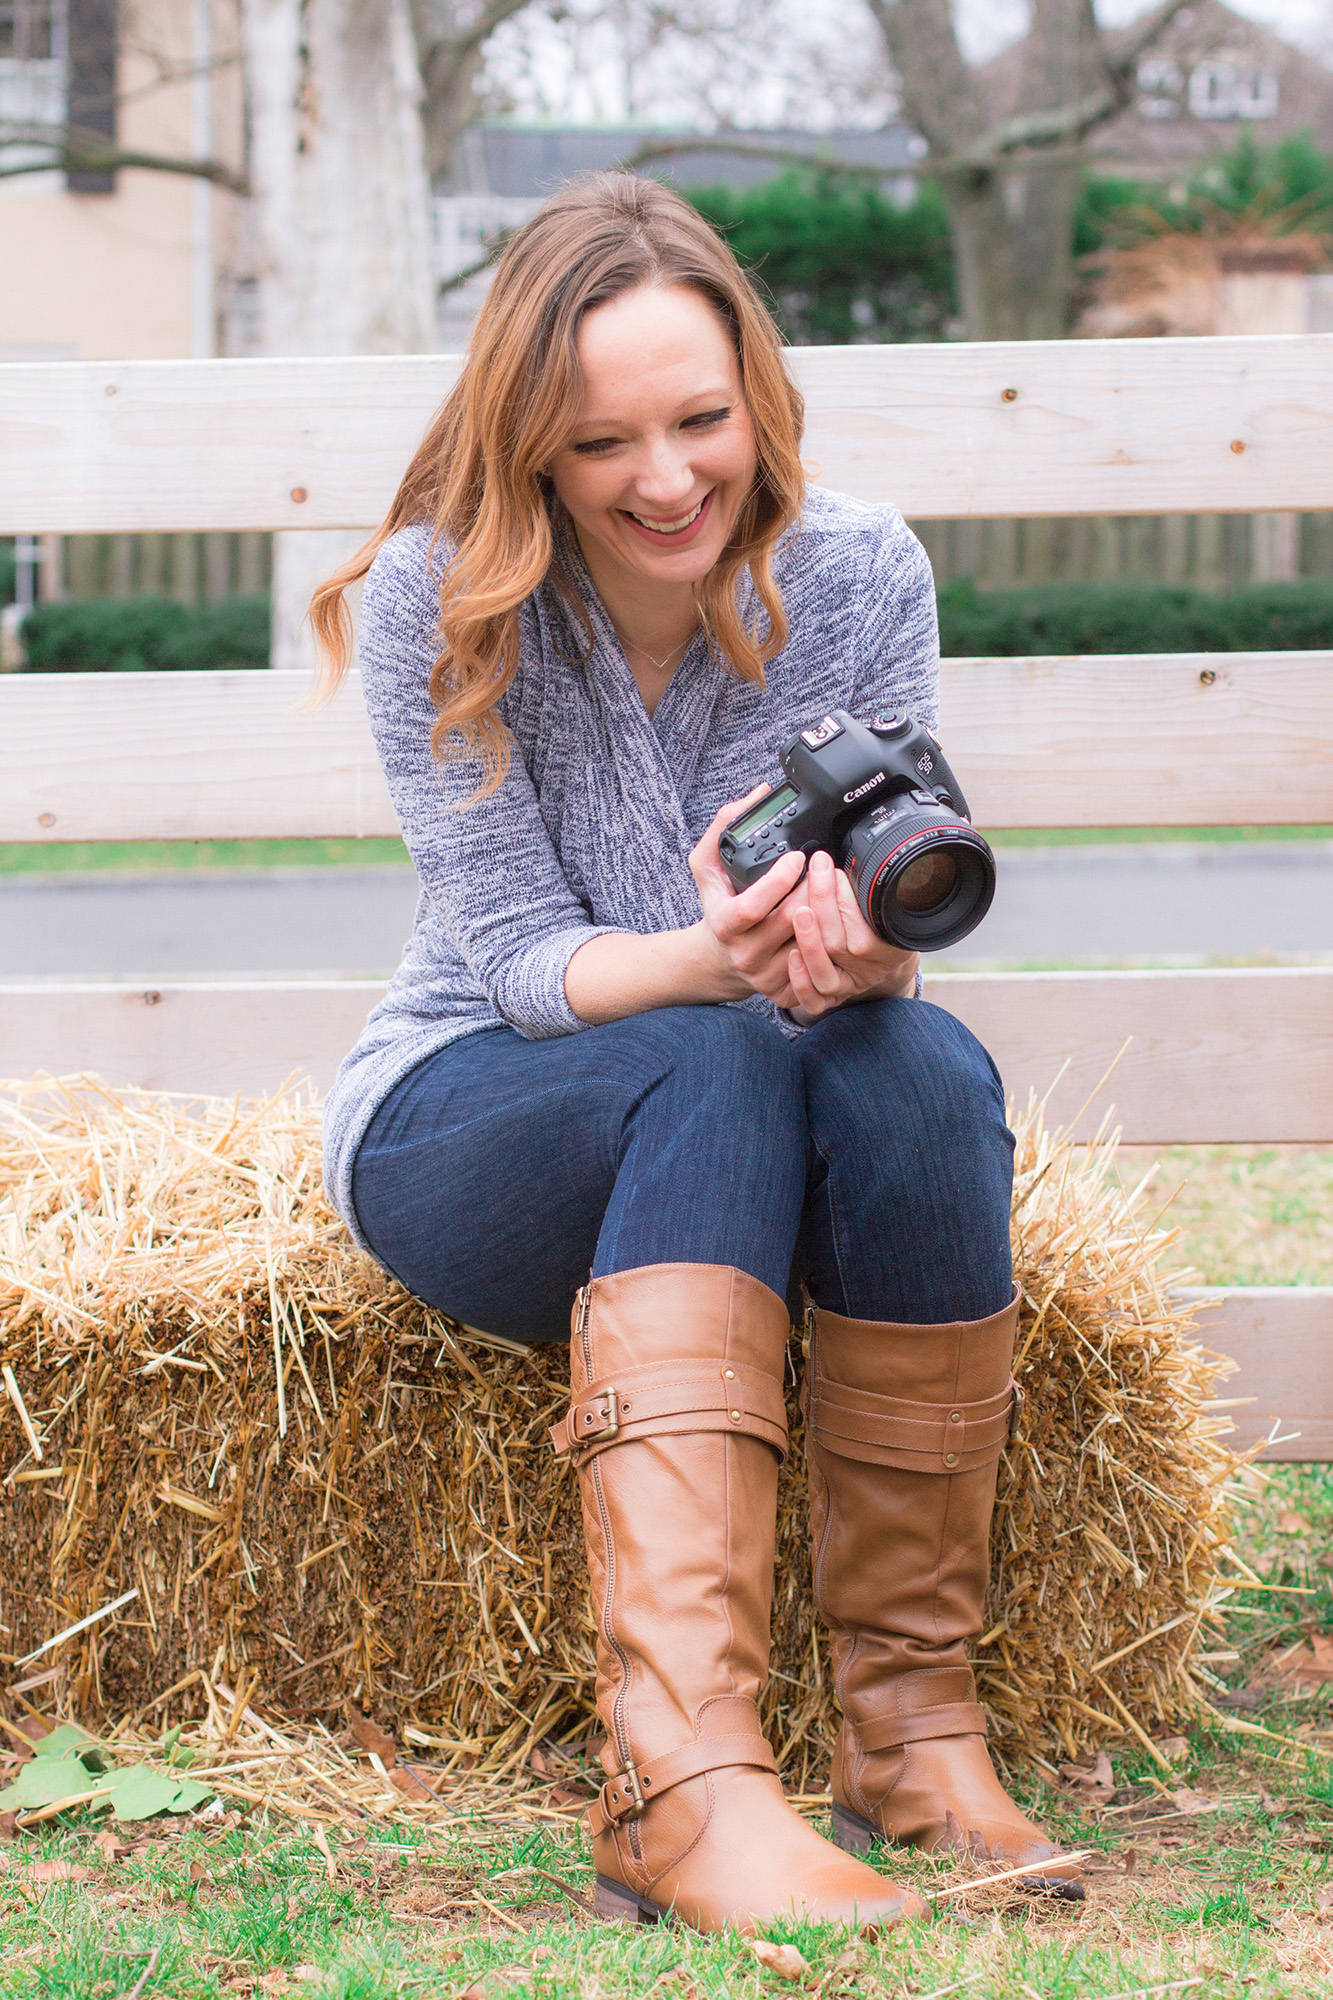 Ginny Filer Photography | ginnyfilerphotography.com